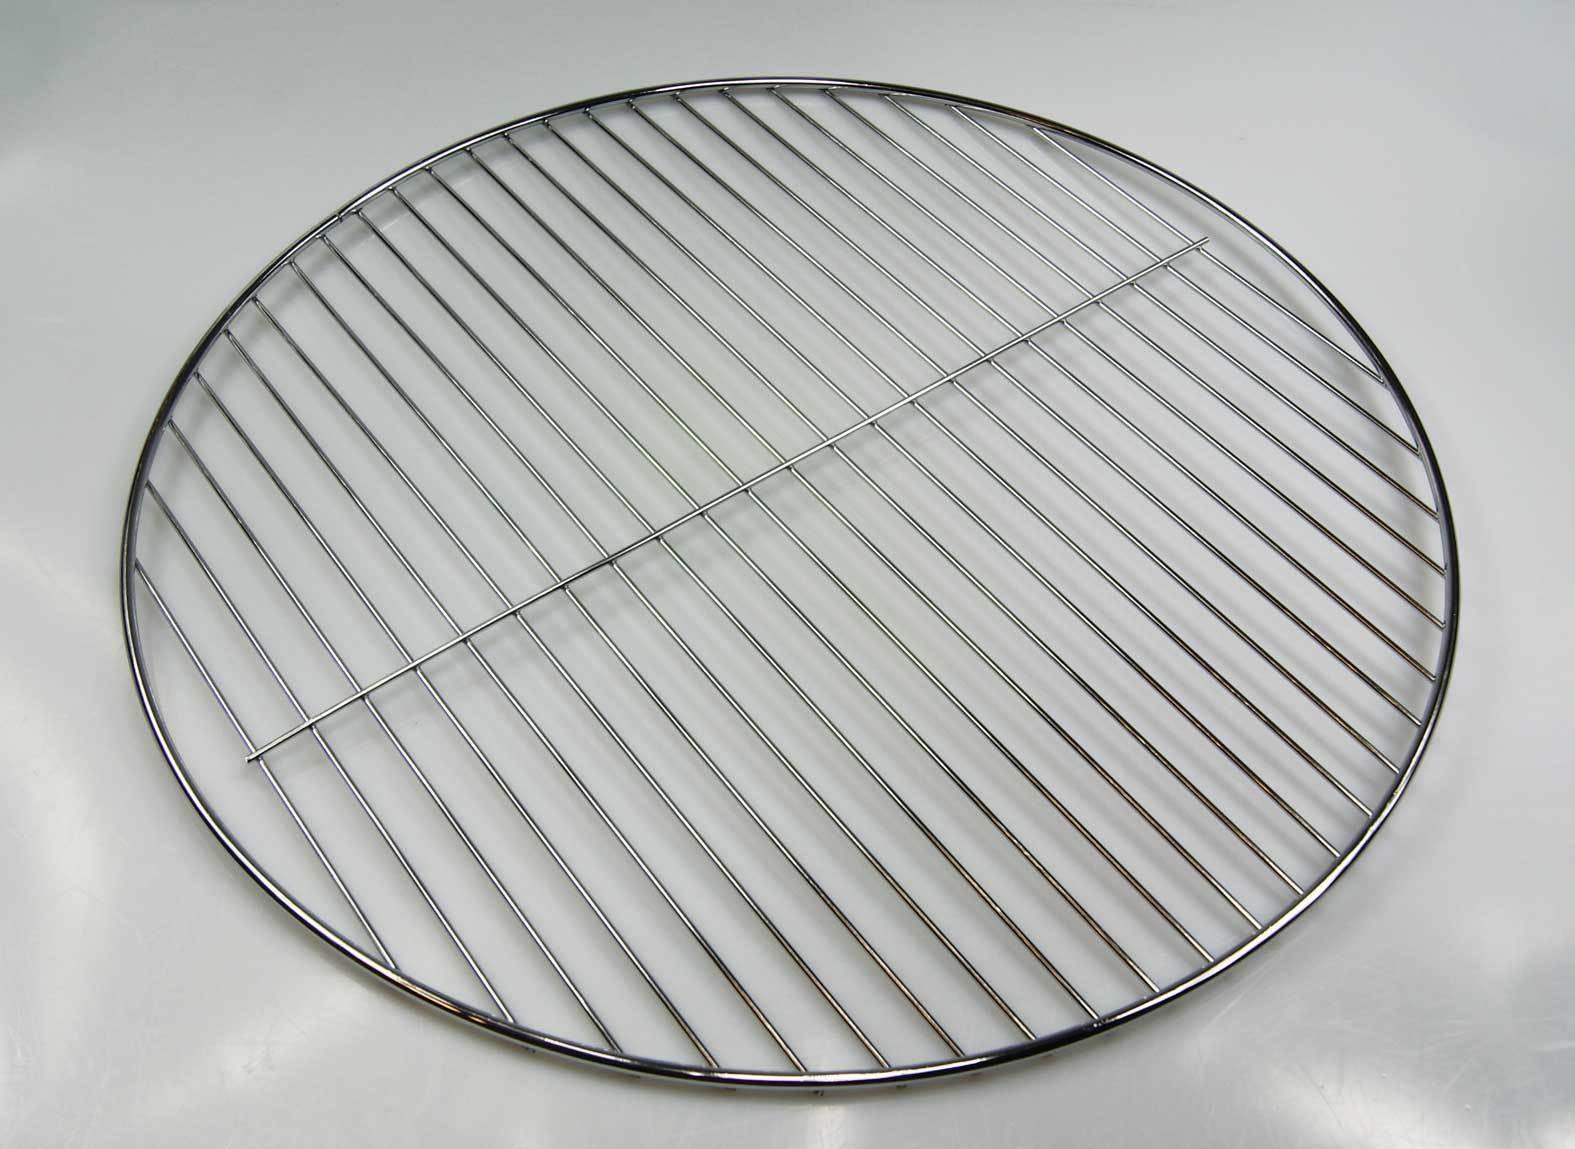 Grillrost verchromt 34,5 / 44,5 / 54,5 cm Kugelgrill für 37 47 57 Weber